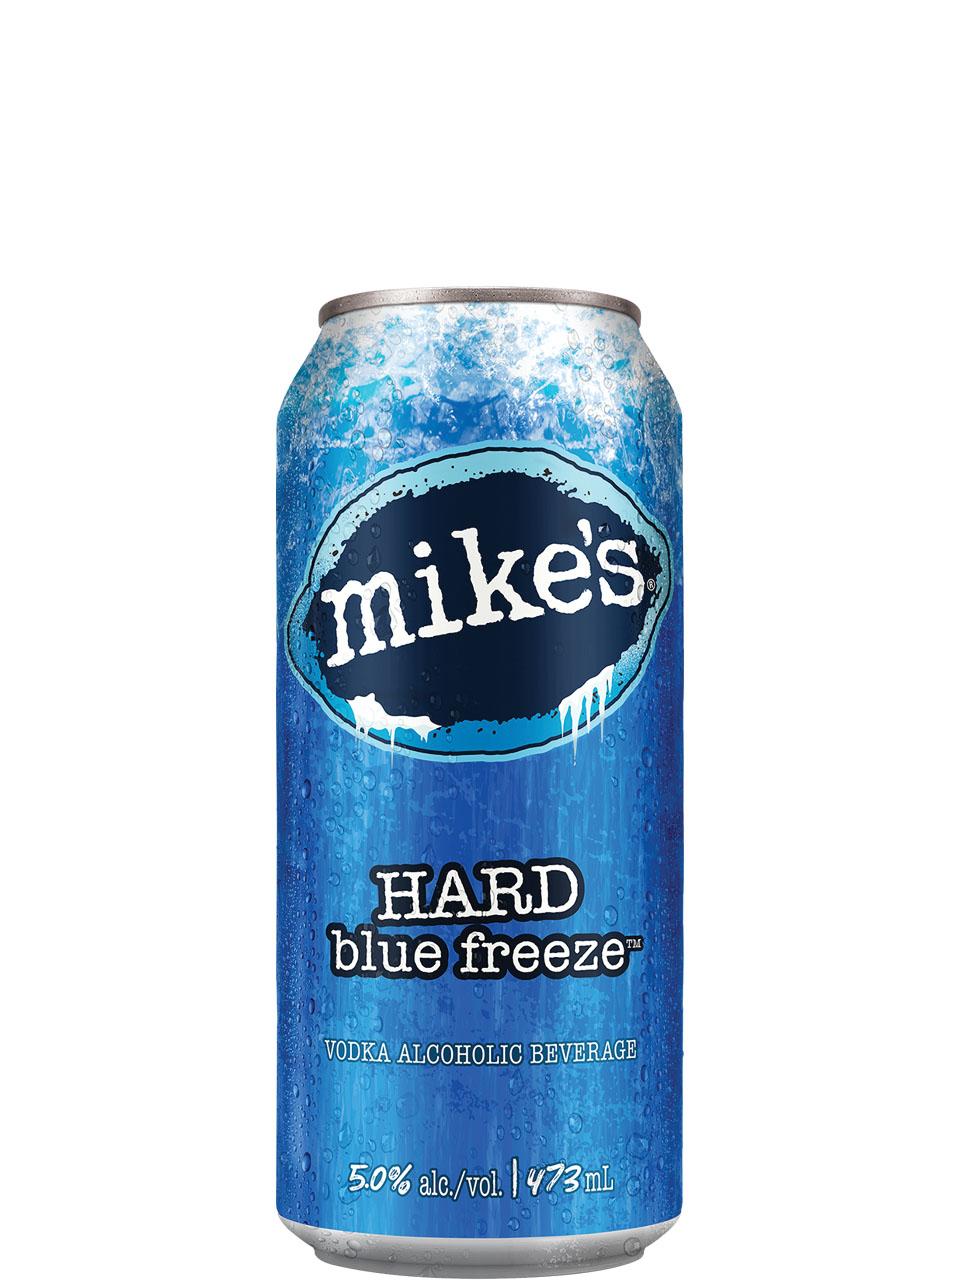 Mike's Hard Blue Freeze 473ml